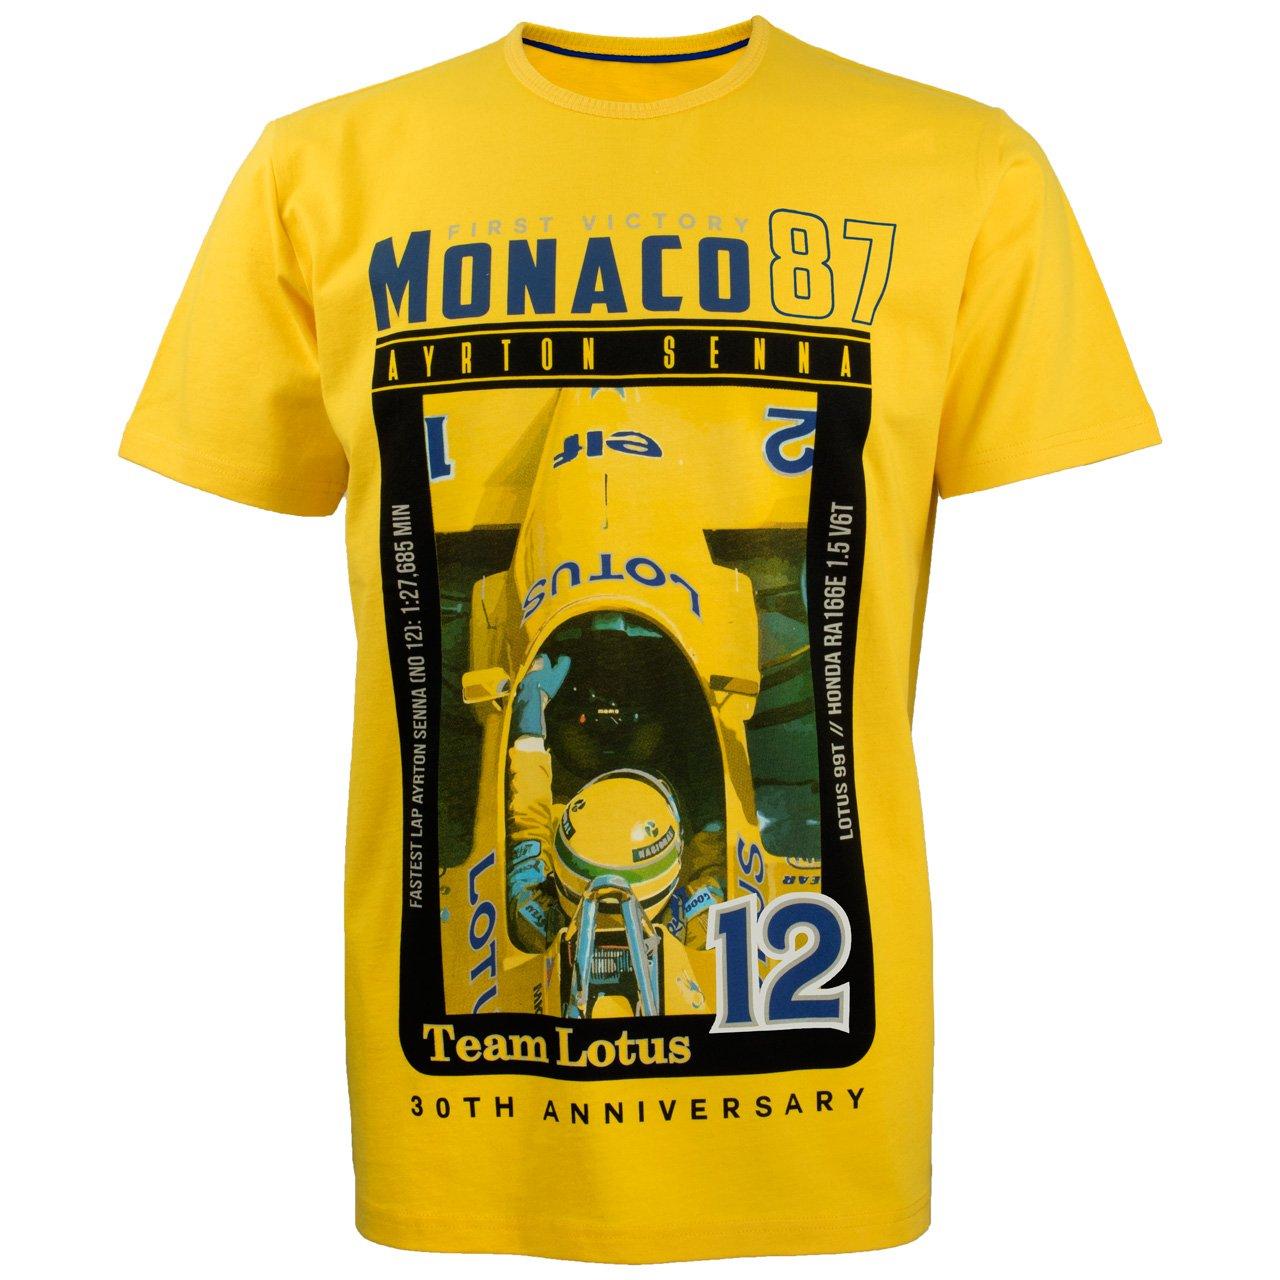 MBA-SPORT Ayrton Senna Lotus Kollektion T-Shirt Monaco 1st Victory 1987 gelb